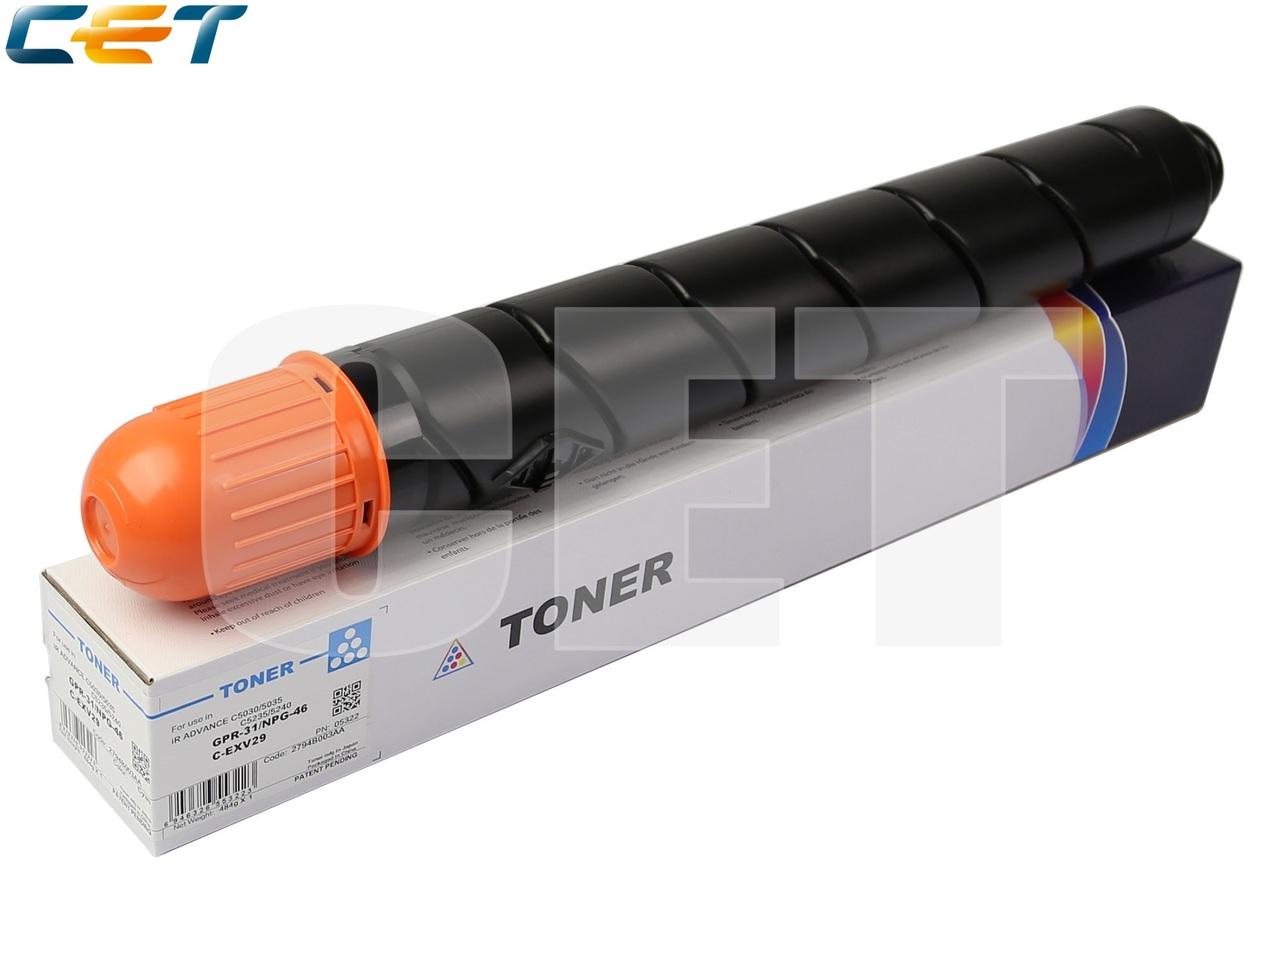 Тонер-картридж (CPP) C-EXV29 для CANON iR ADVANCEC5030/C5035/C5235/C5240 (CET) Cyan, 484г, 27000 стр.,CET5322